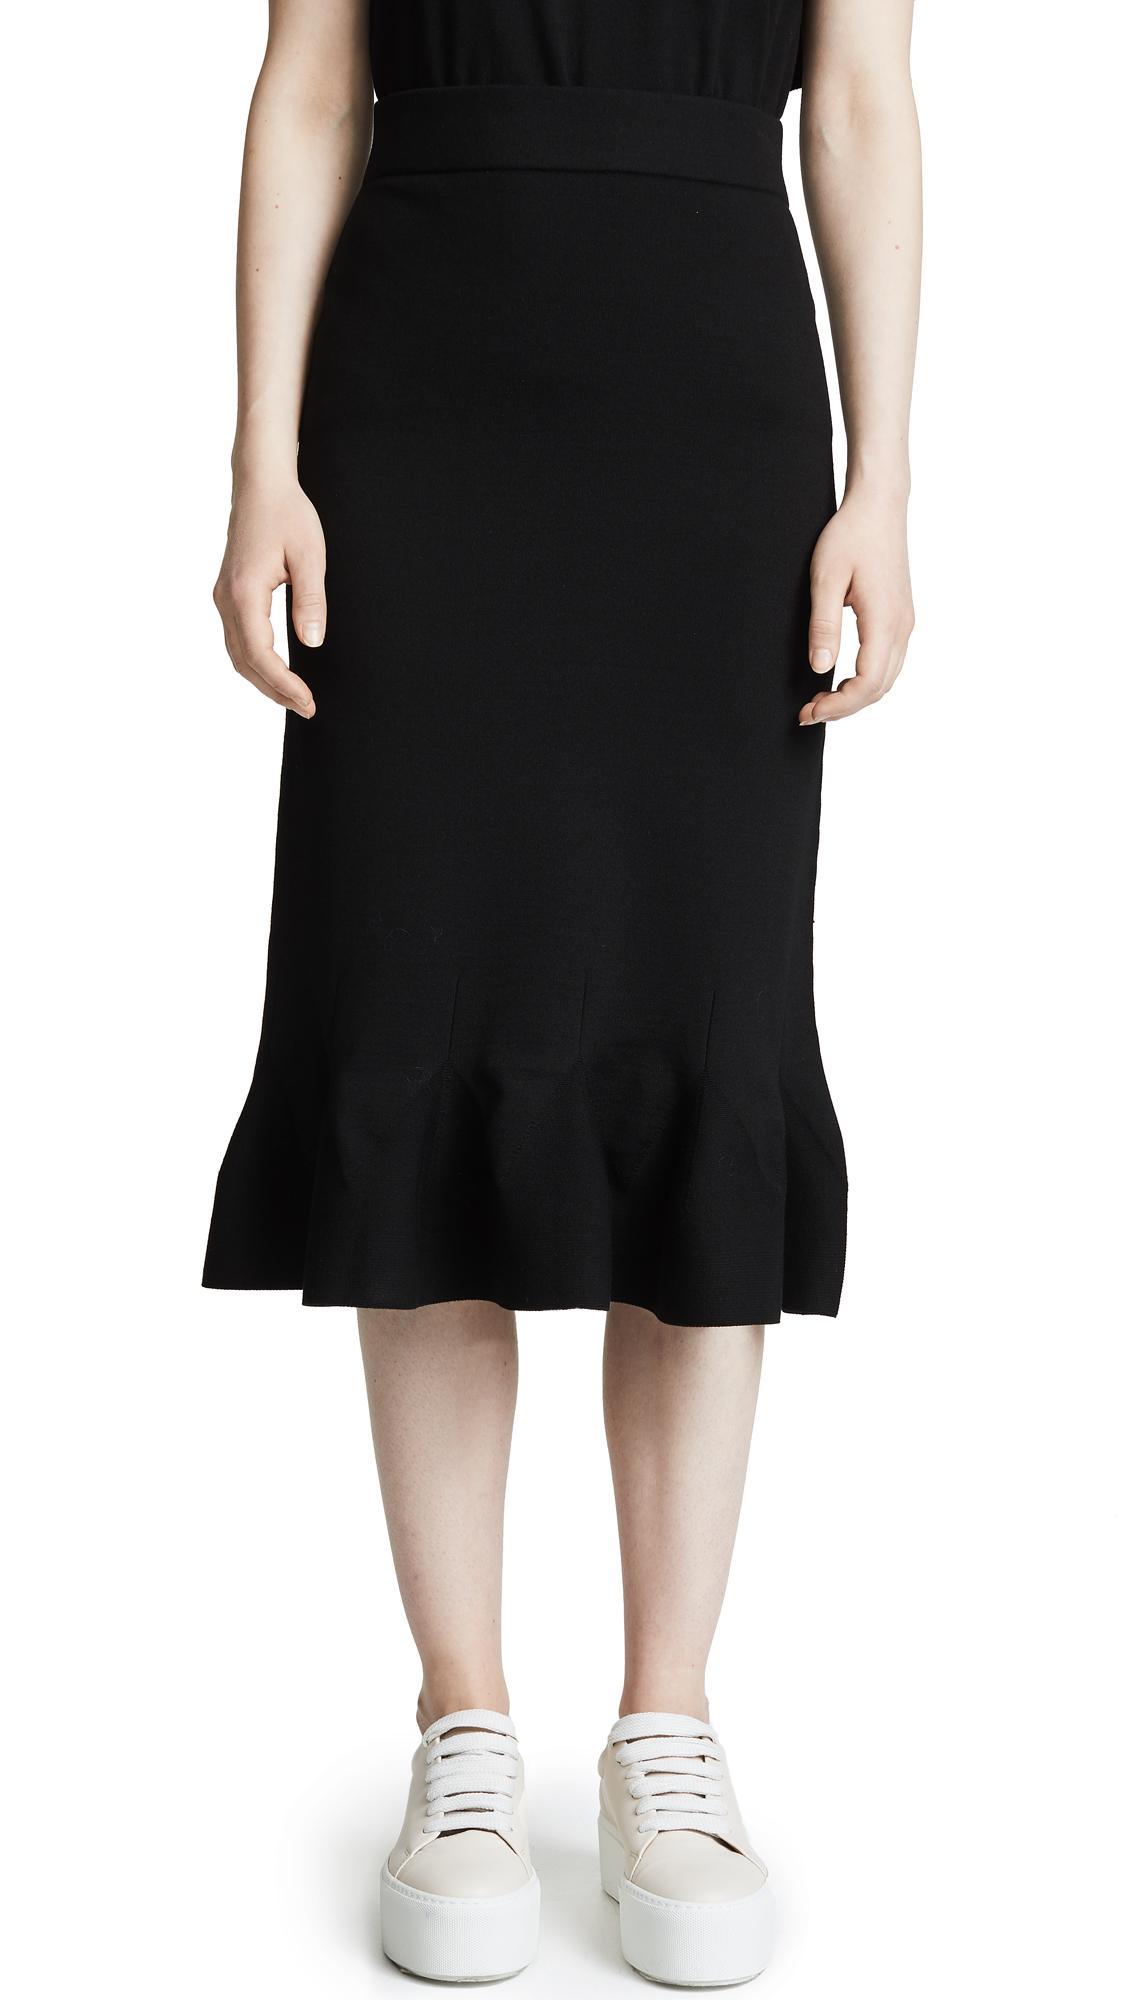 RhiÉ Perry Ruffle Pencil Skirt In Black